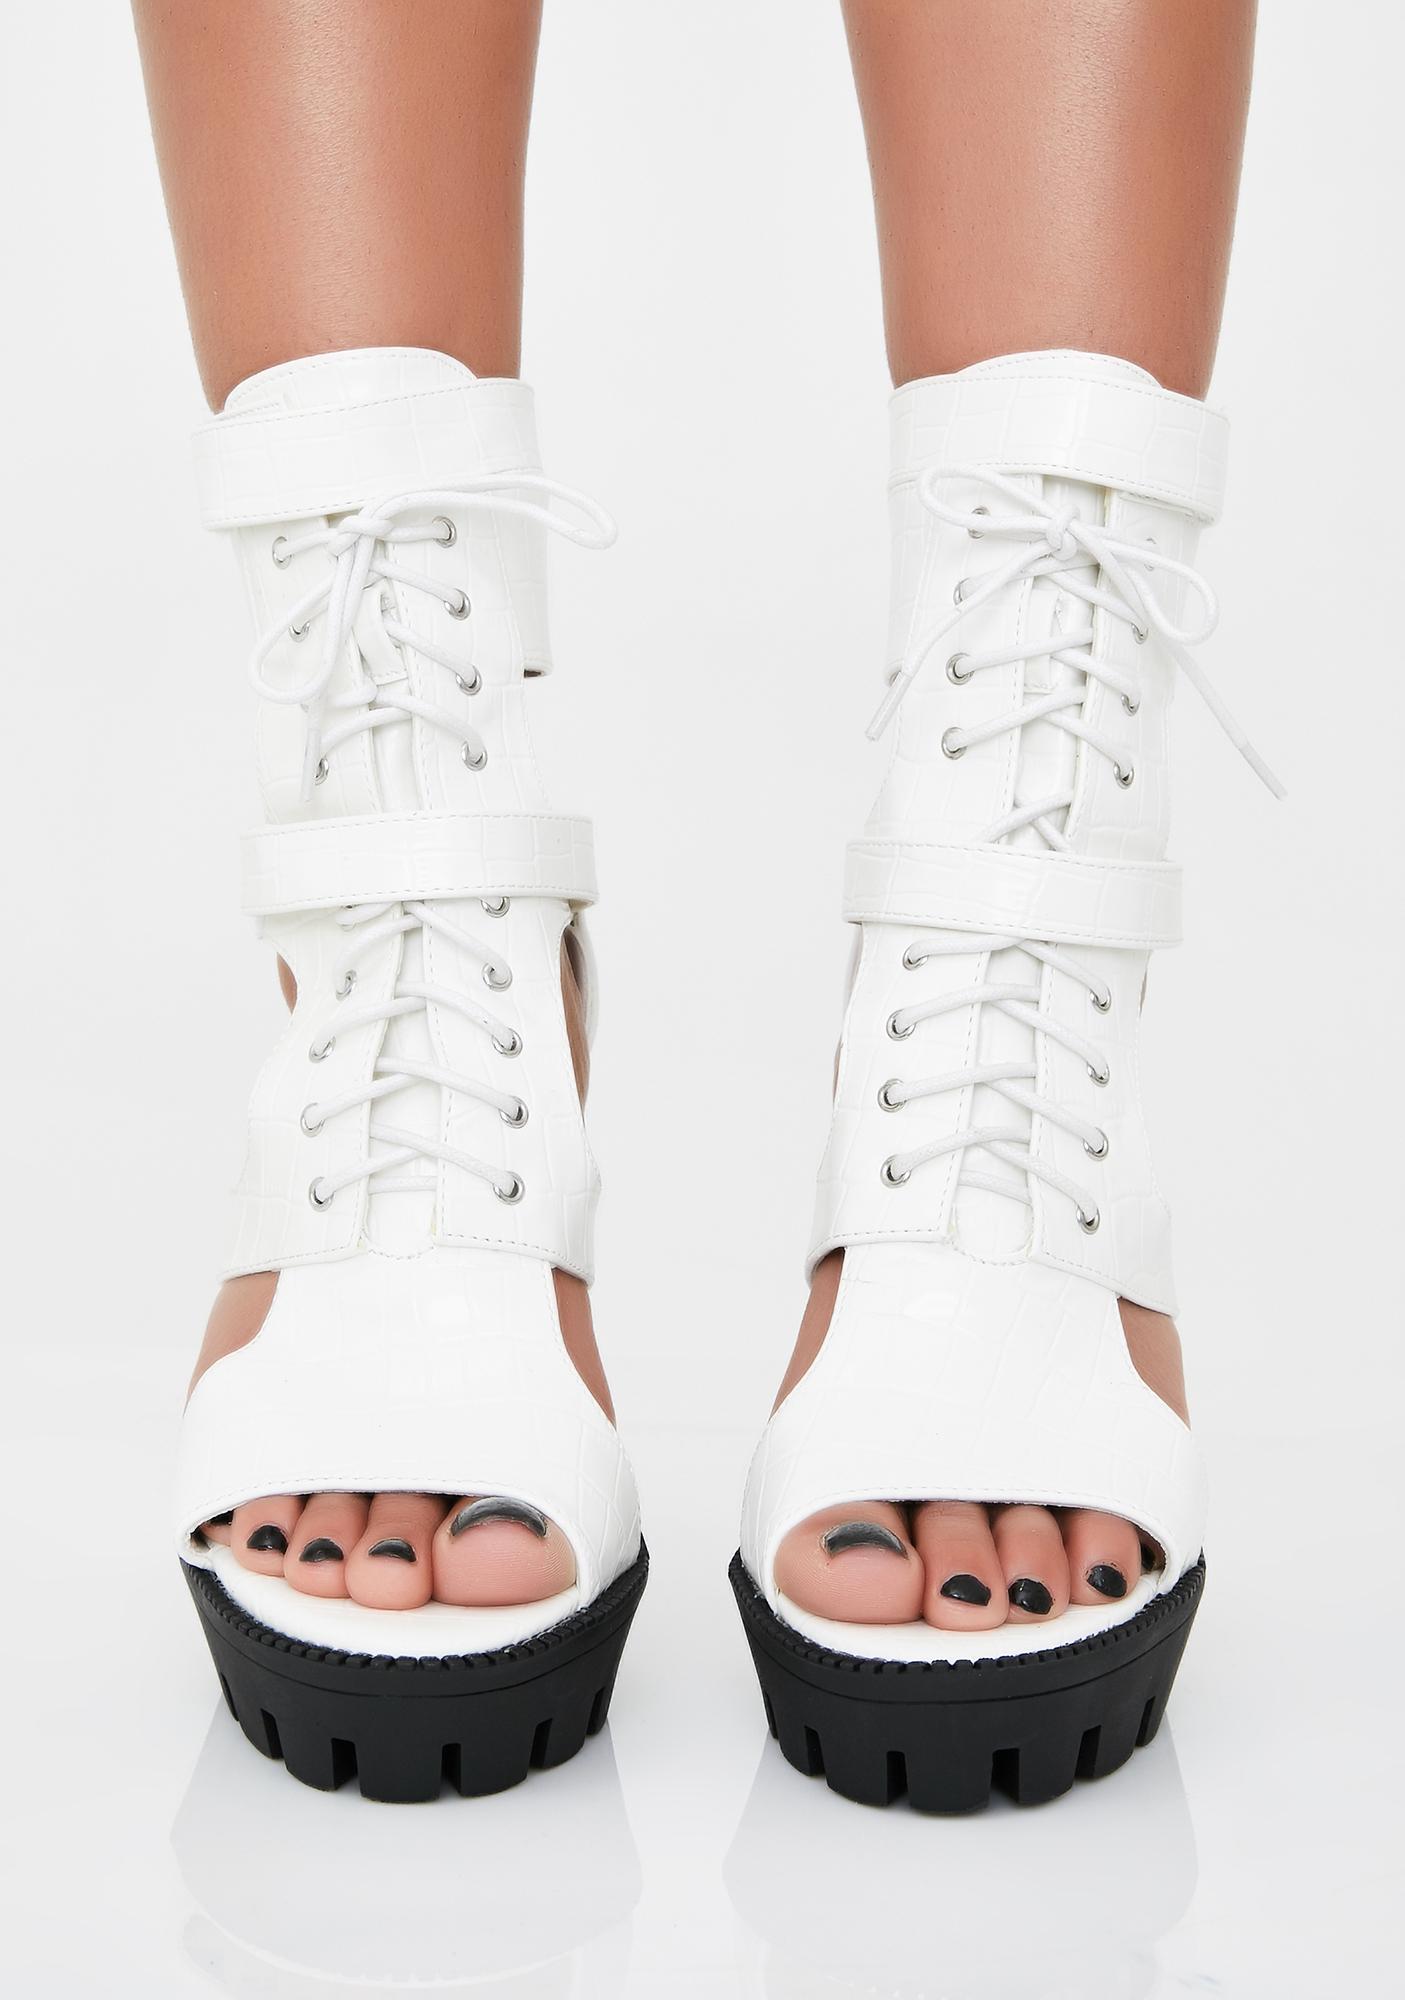 Quartz Hunty Status Lace Up Heels